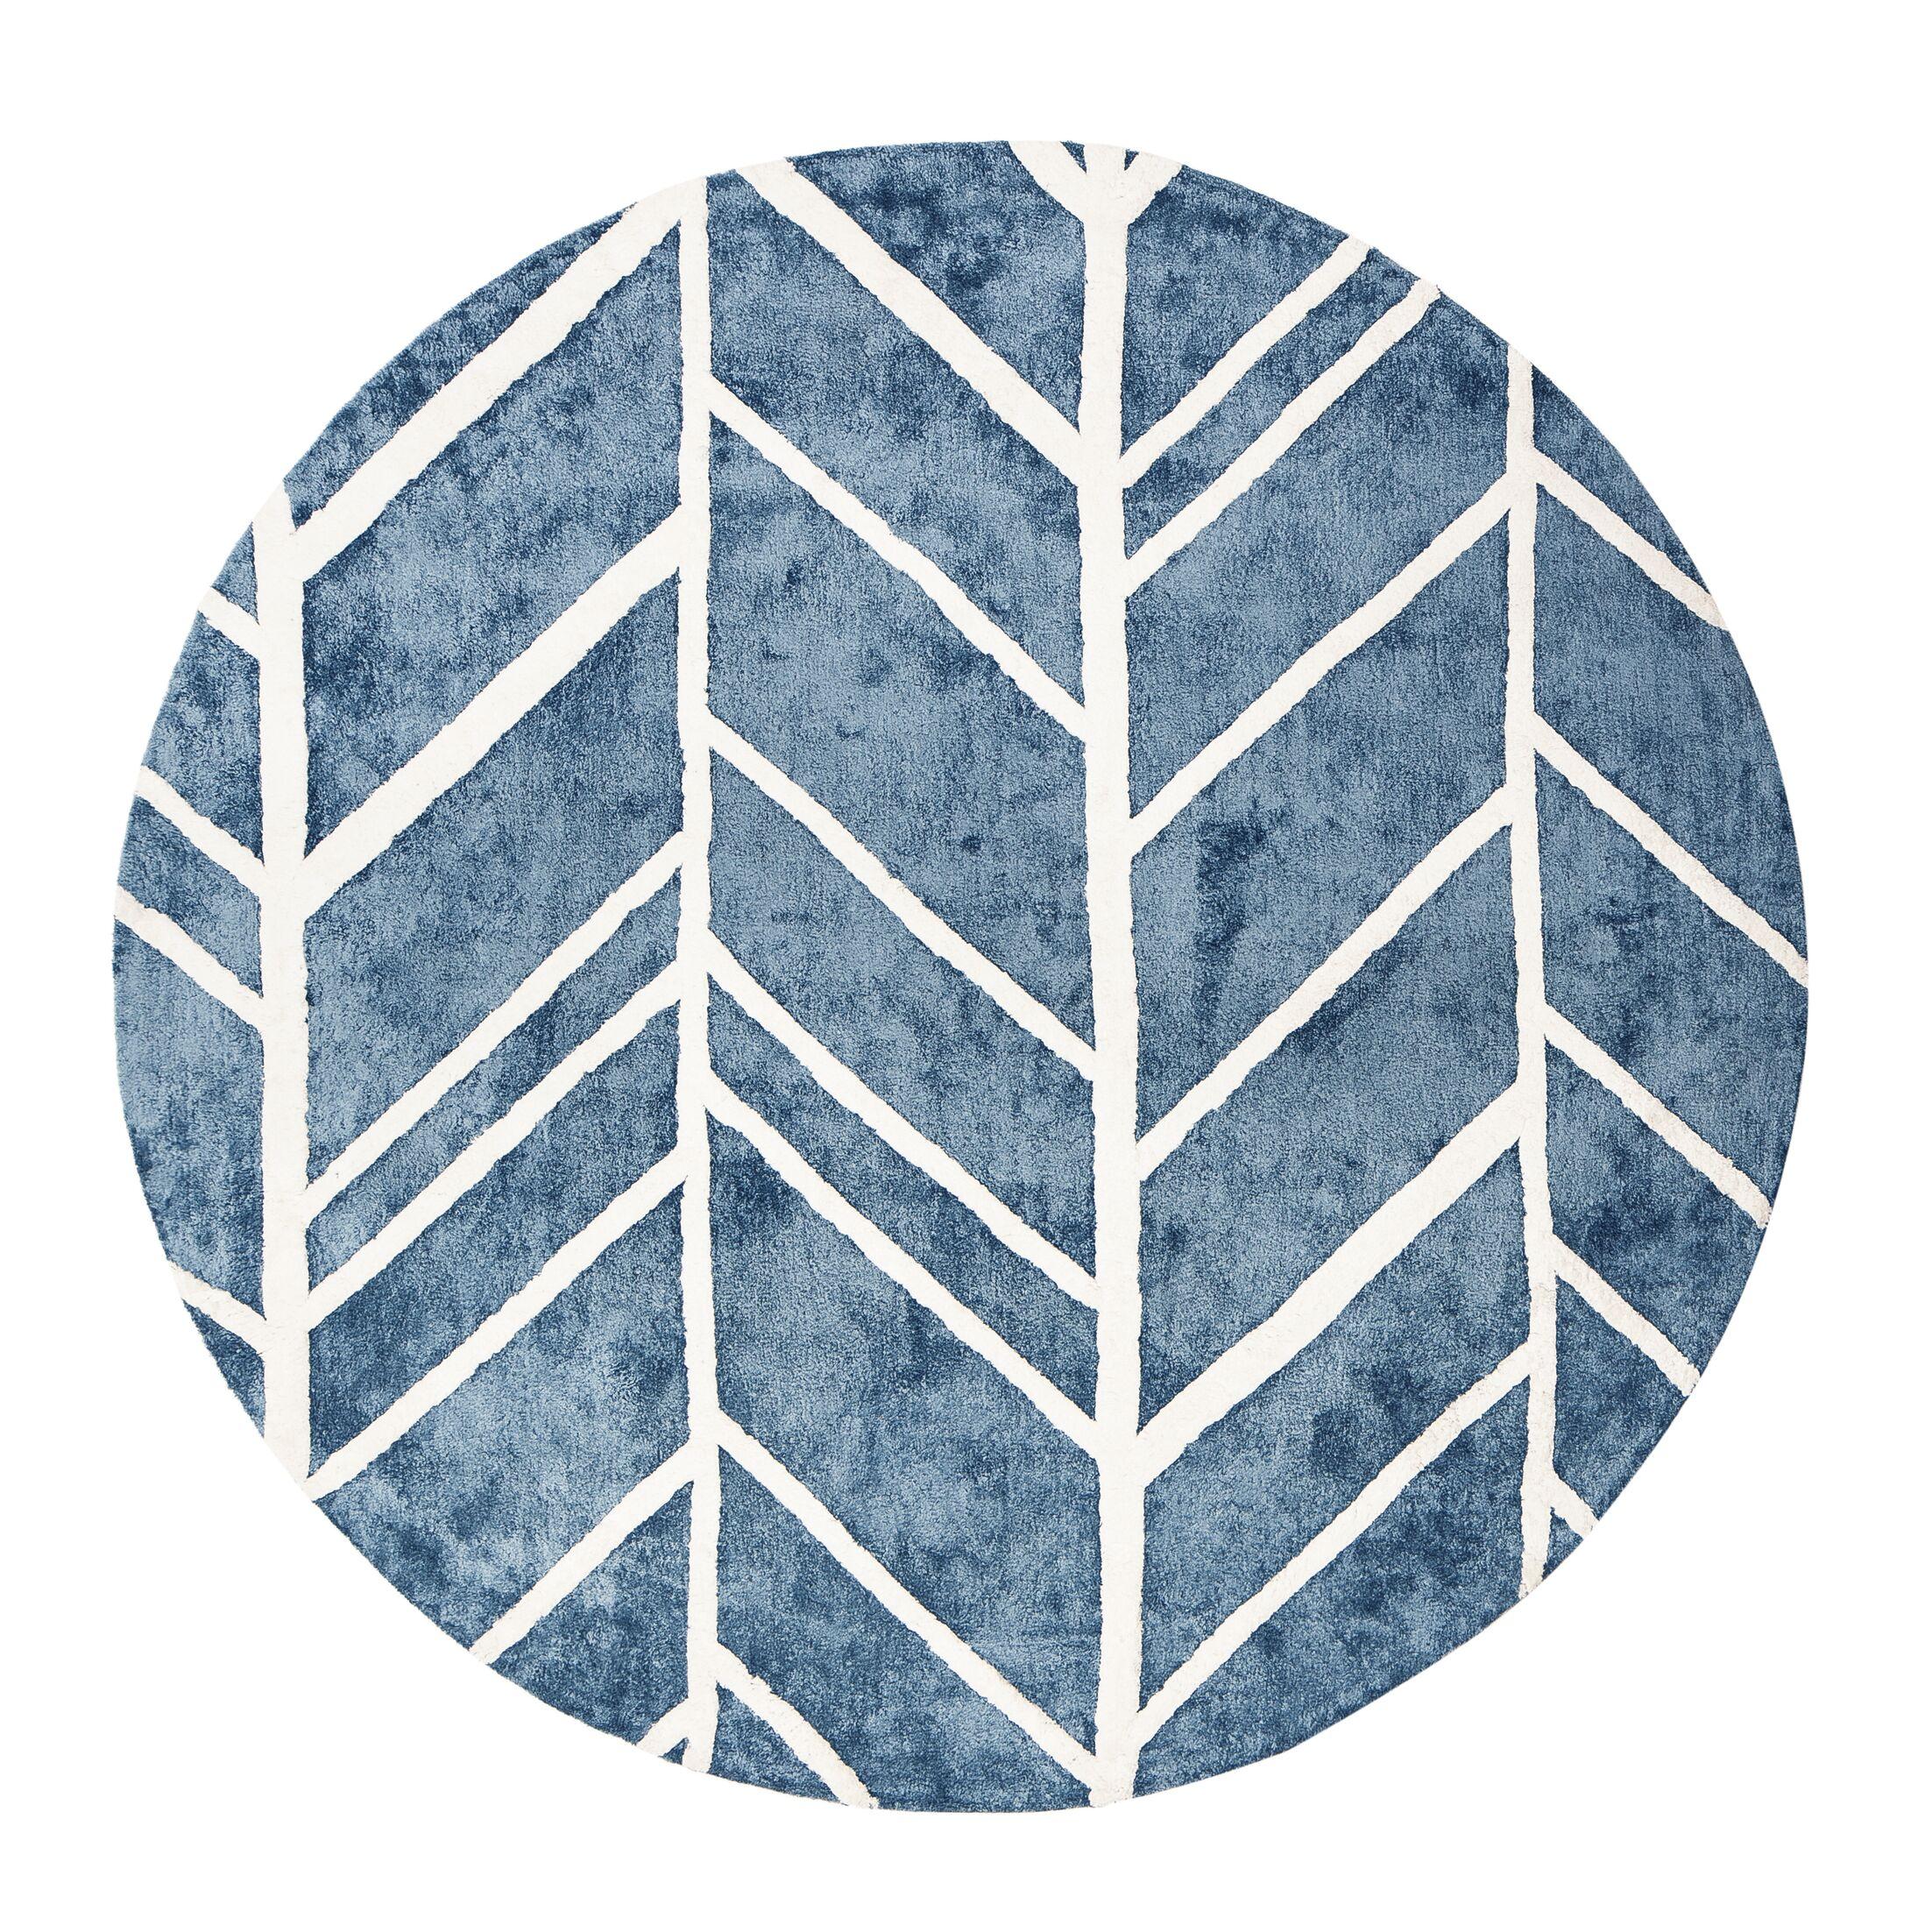 Castleberry Blue Area Rug Rug Size: Round 6'